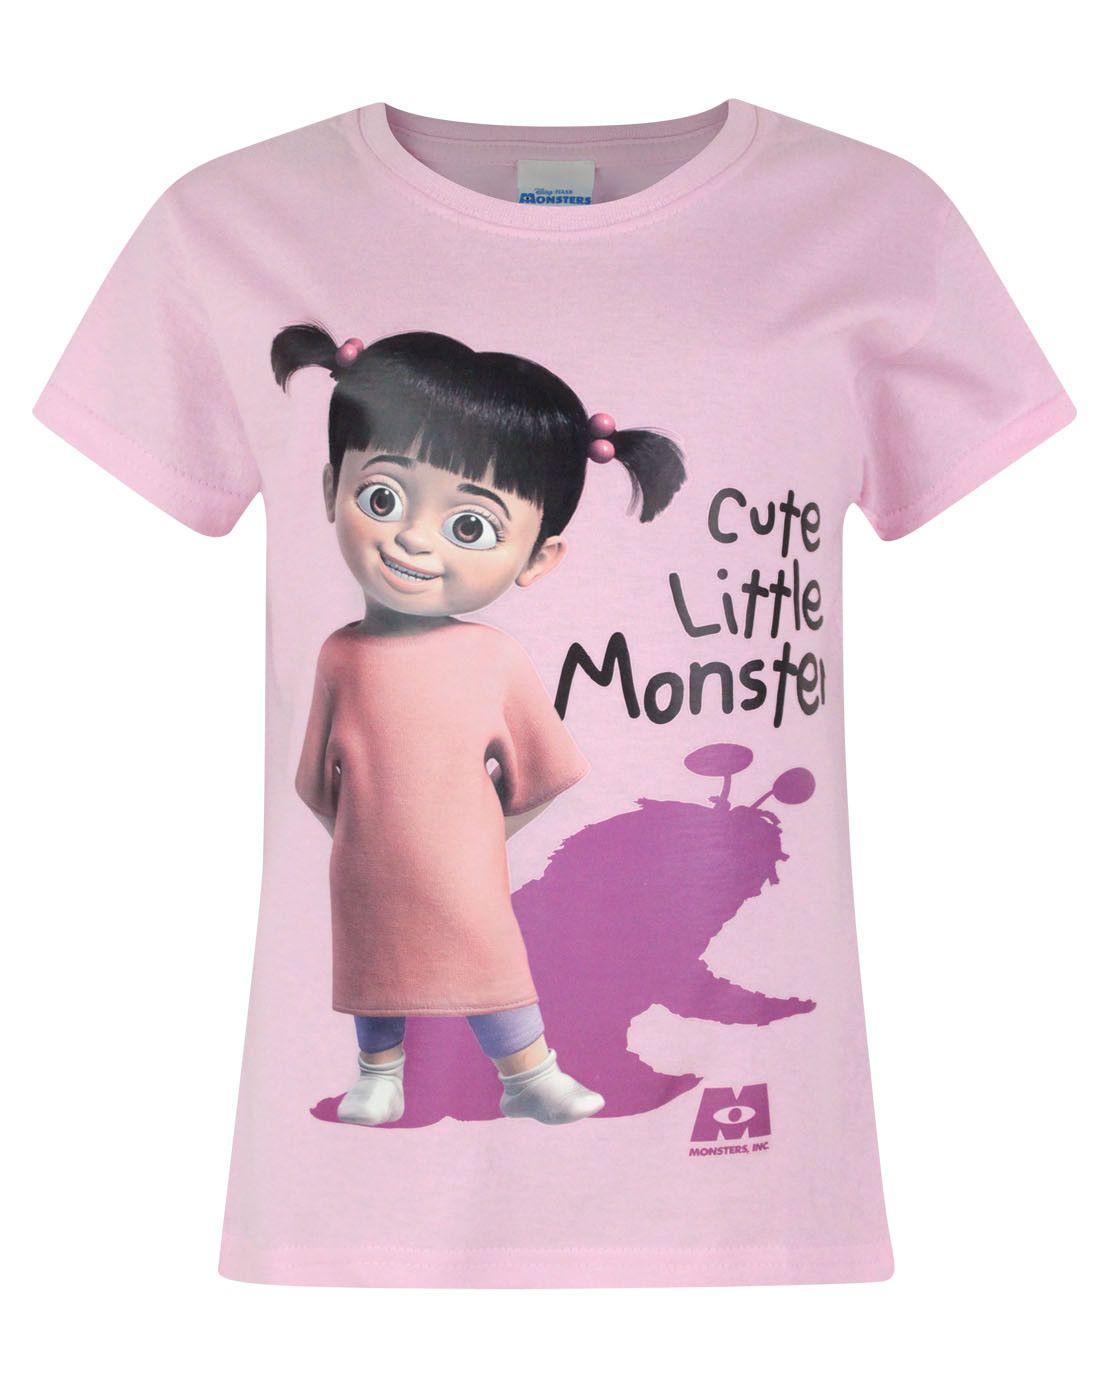 Official Monsters Inc Boo Cute Little Monster Girl\'s T-Shirt ...